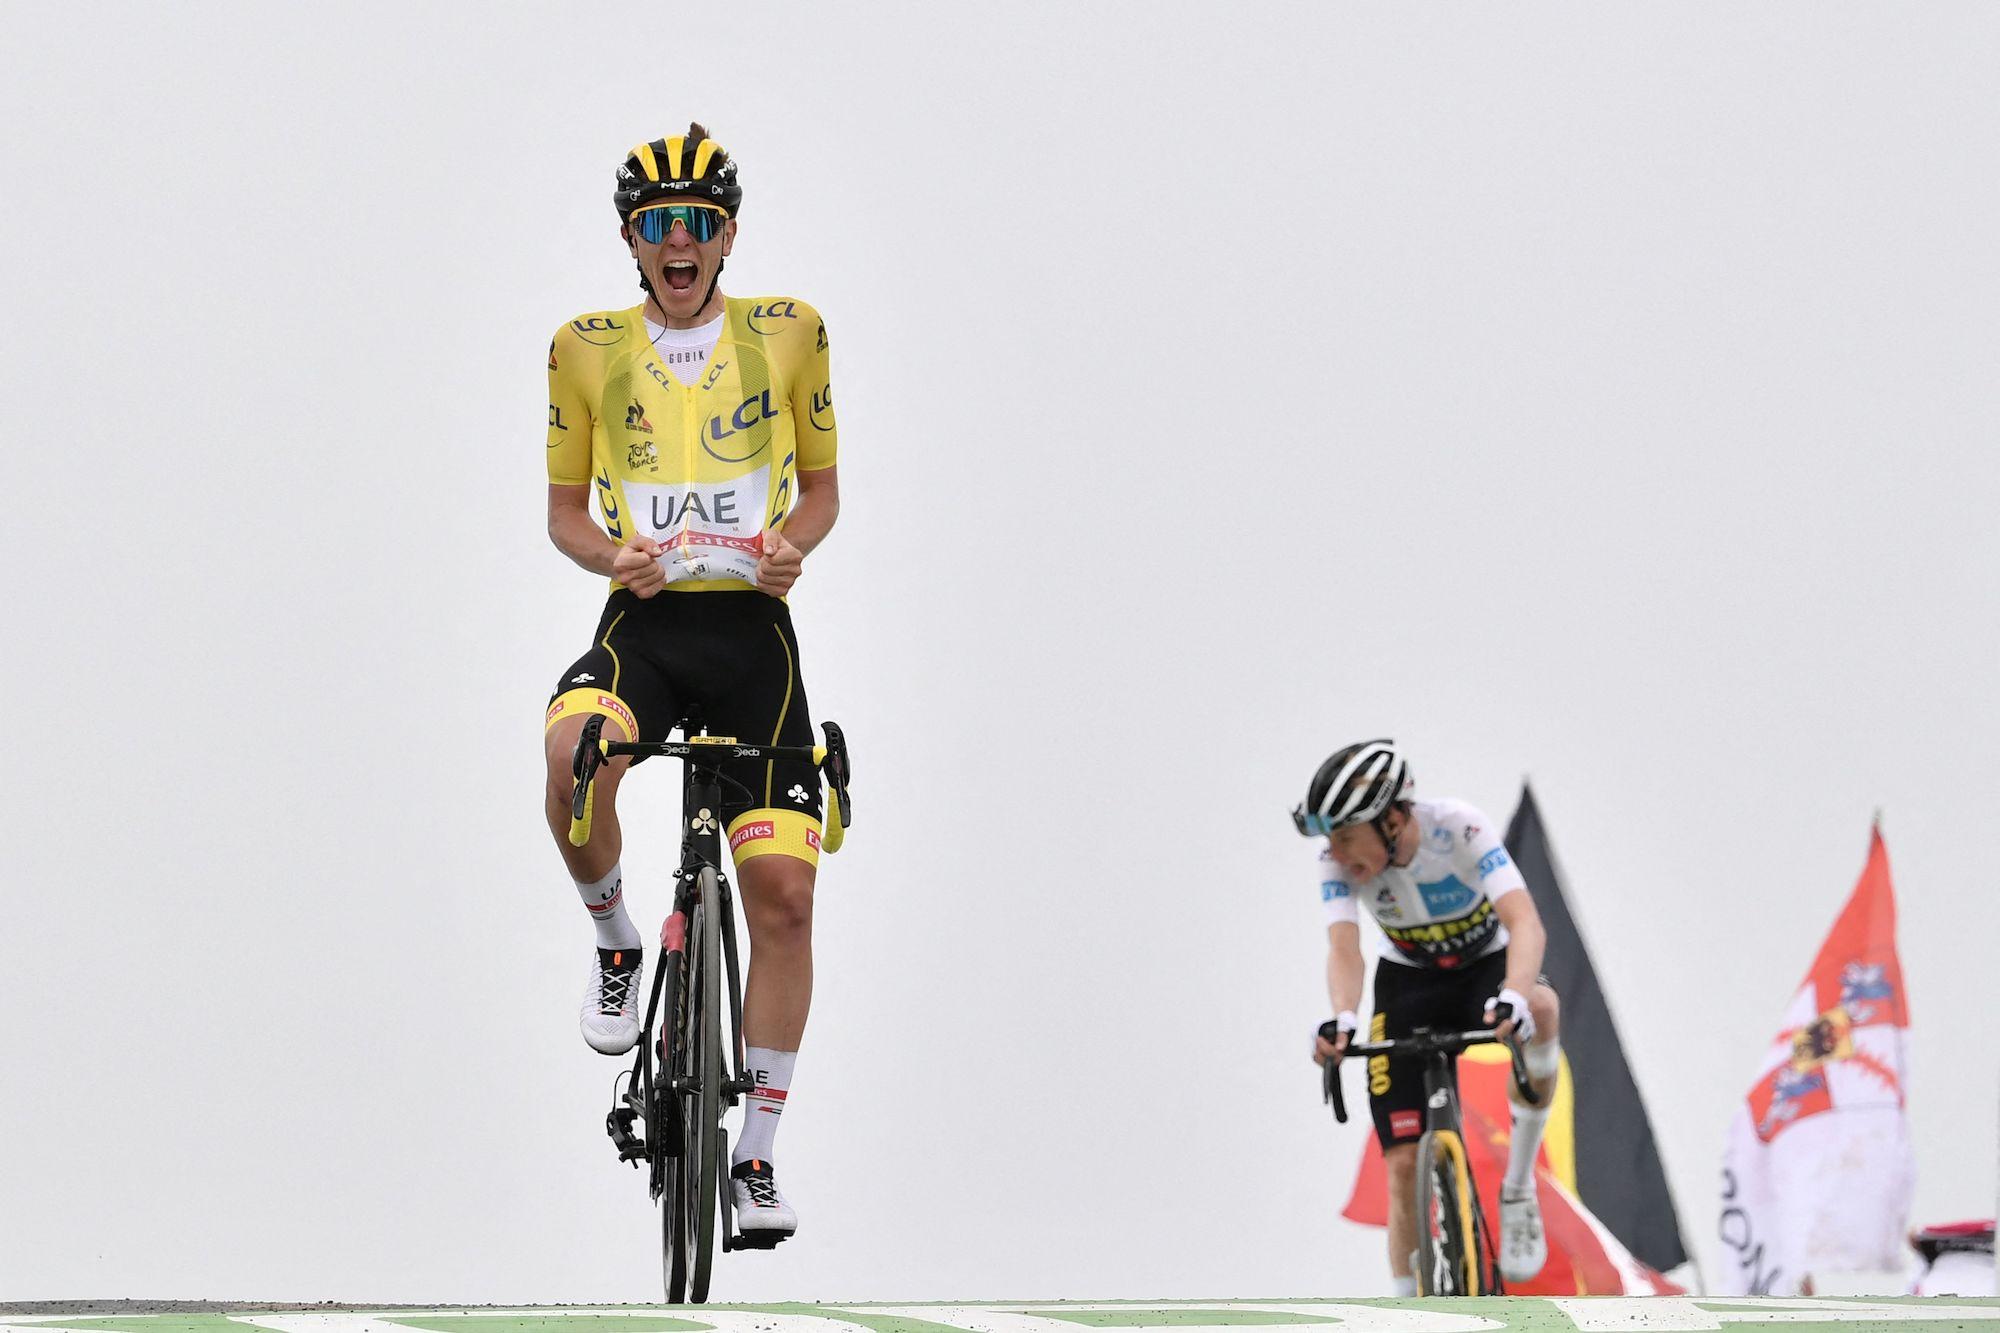 Tadej Pogacar wins stage 17 of the 2021 Tour de France